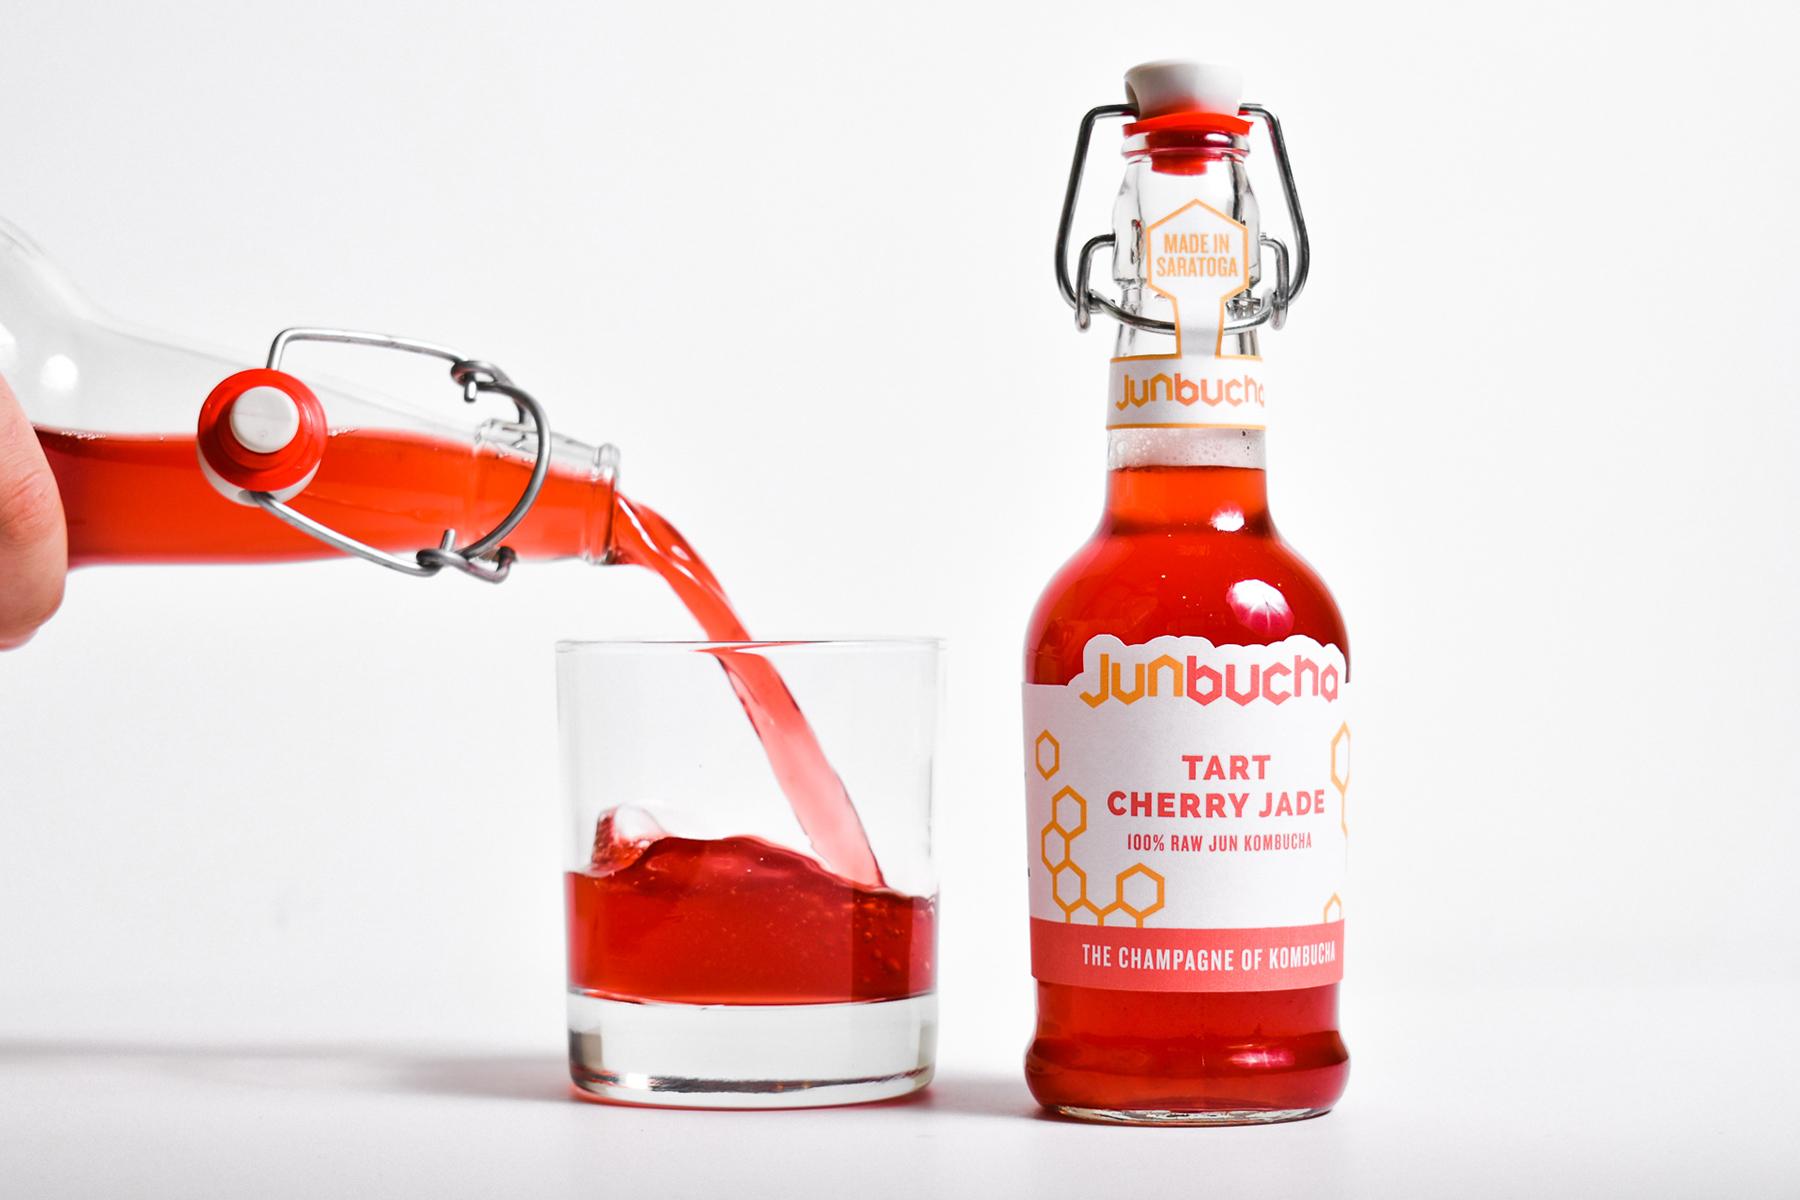 Packaging design on bottle